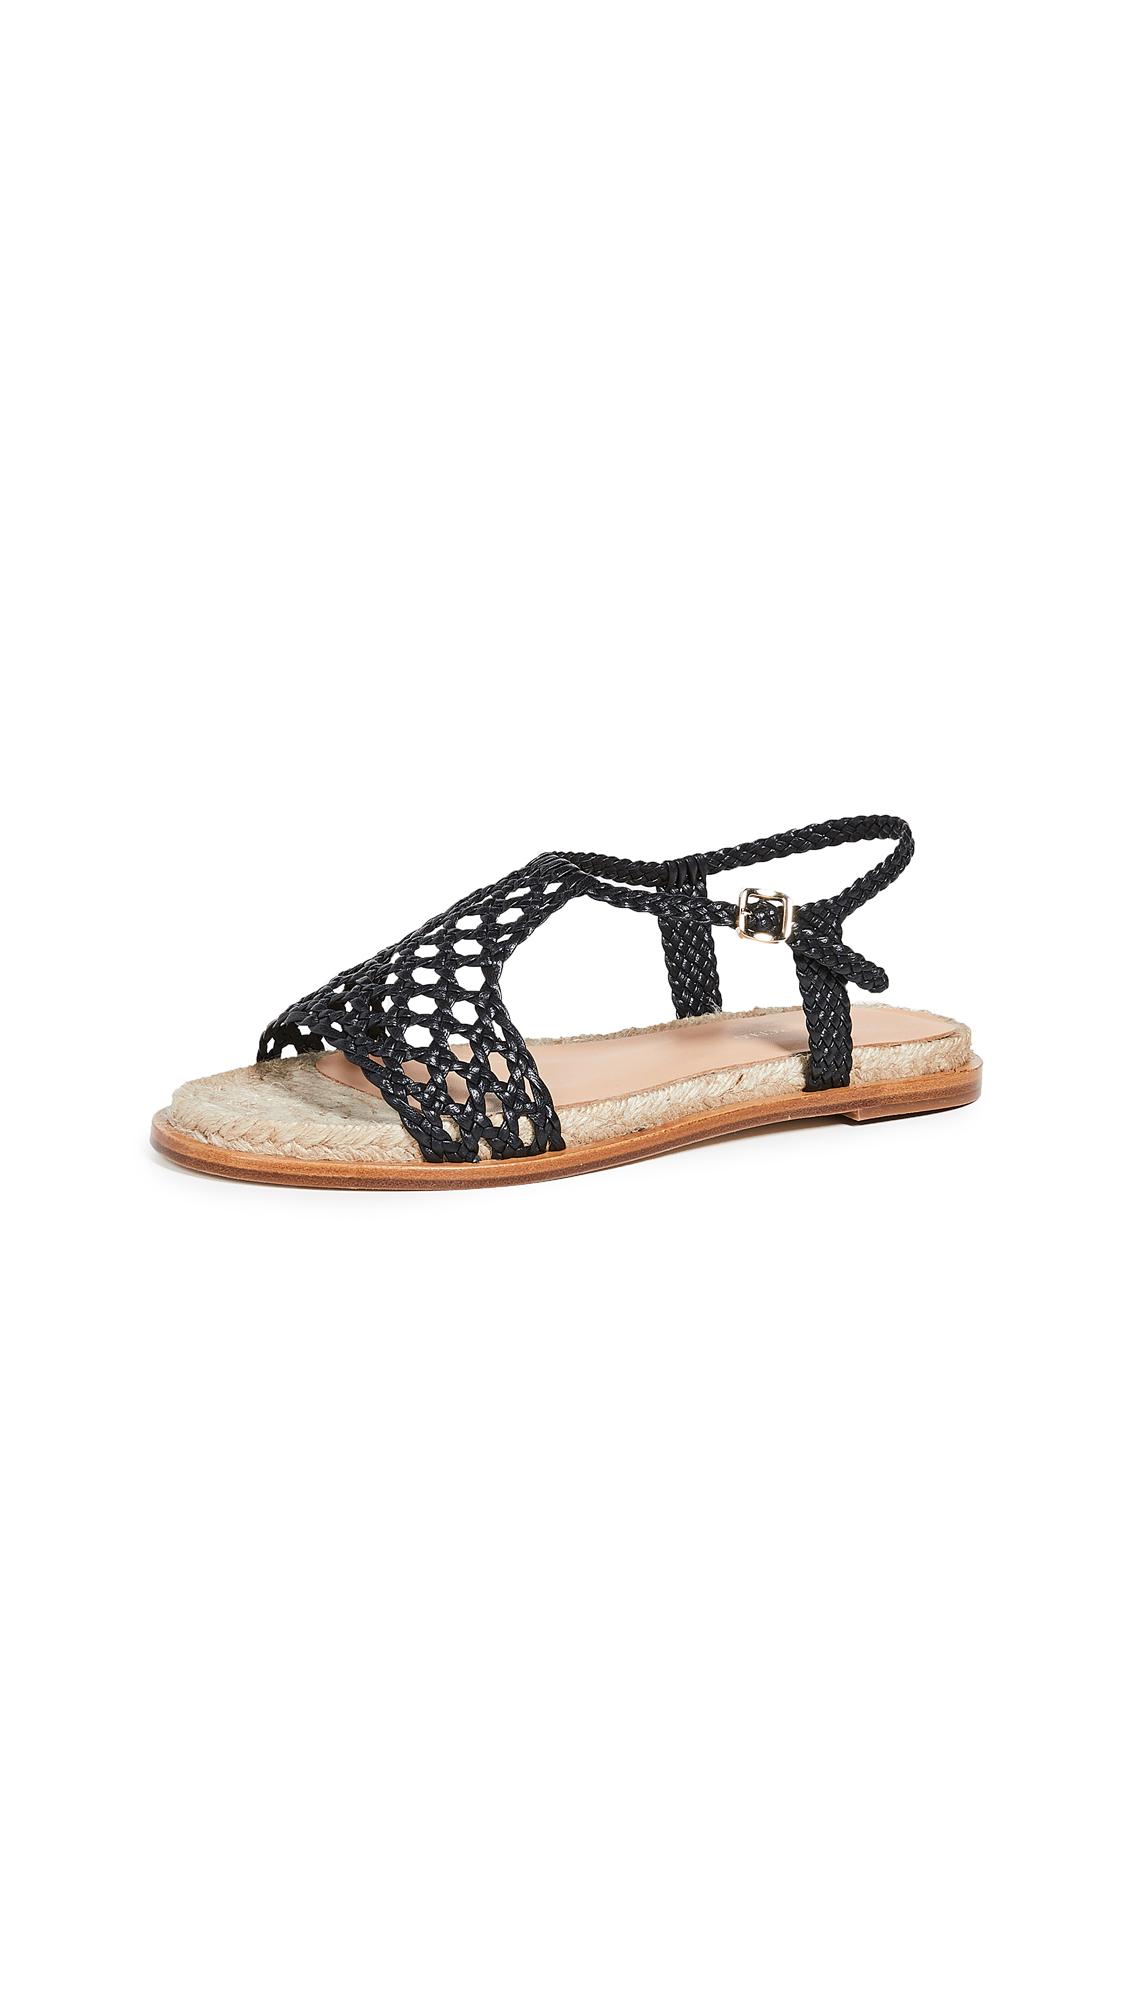 Paloma Barcelo Sandrine Woven Flat Sandals - Black